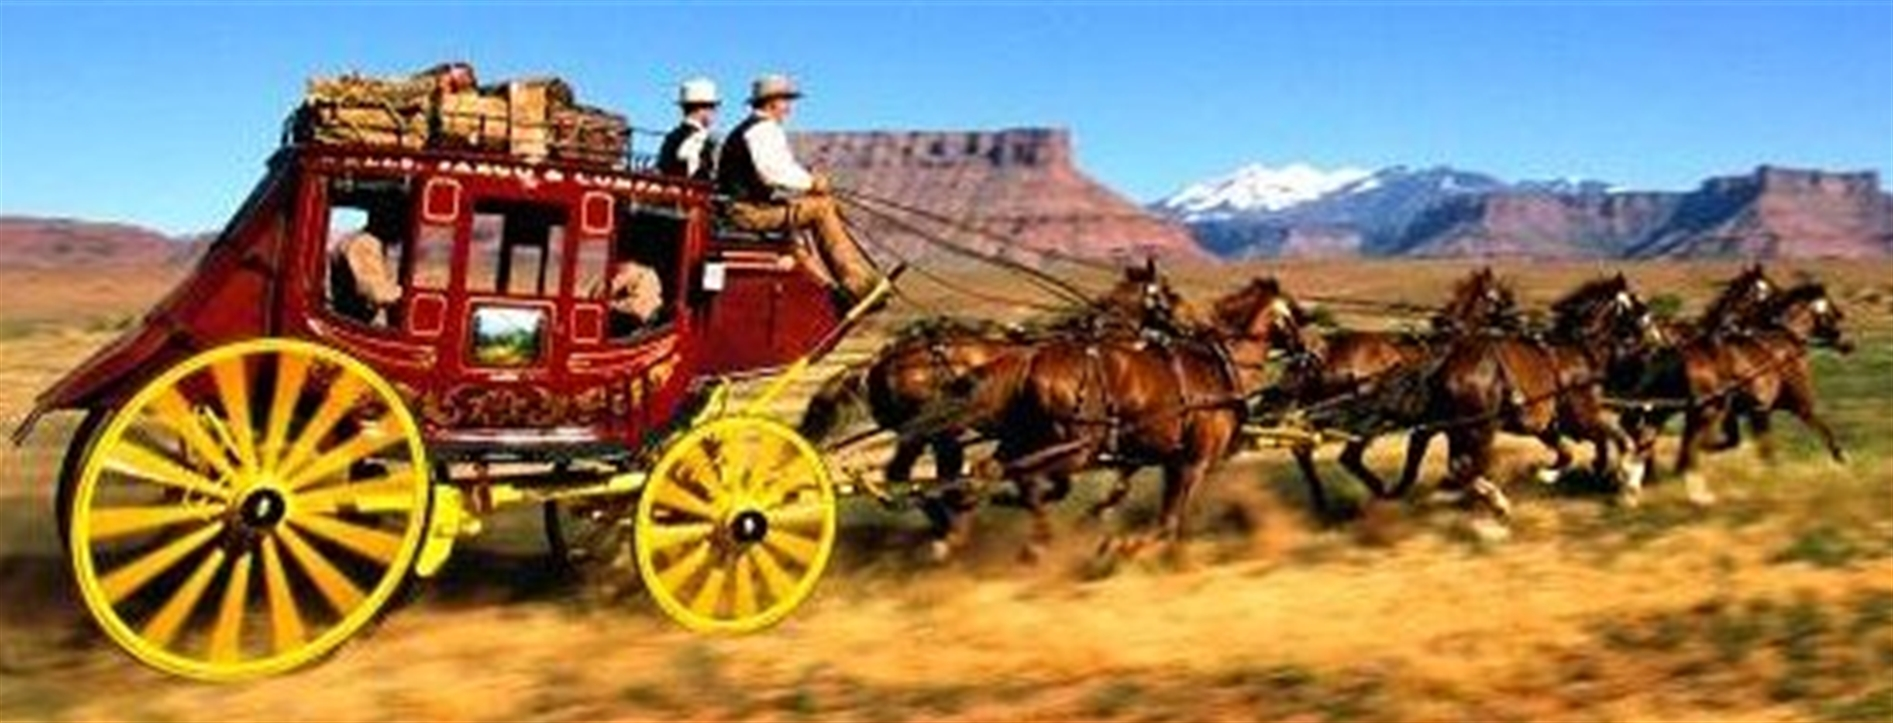 wells fargo stagecoach21 jpg 1893 723 stagecoach pinterest